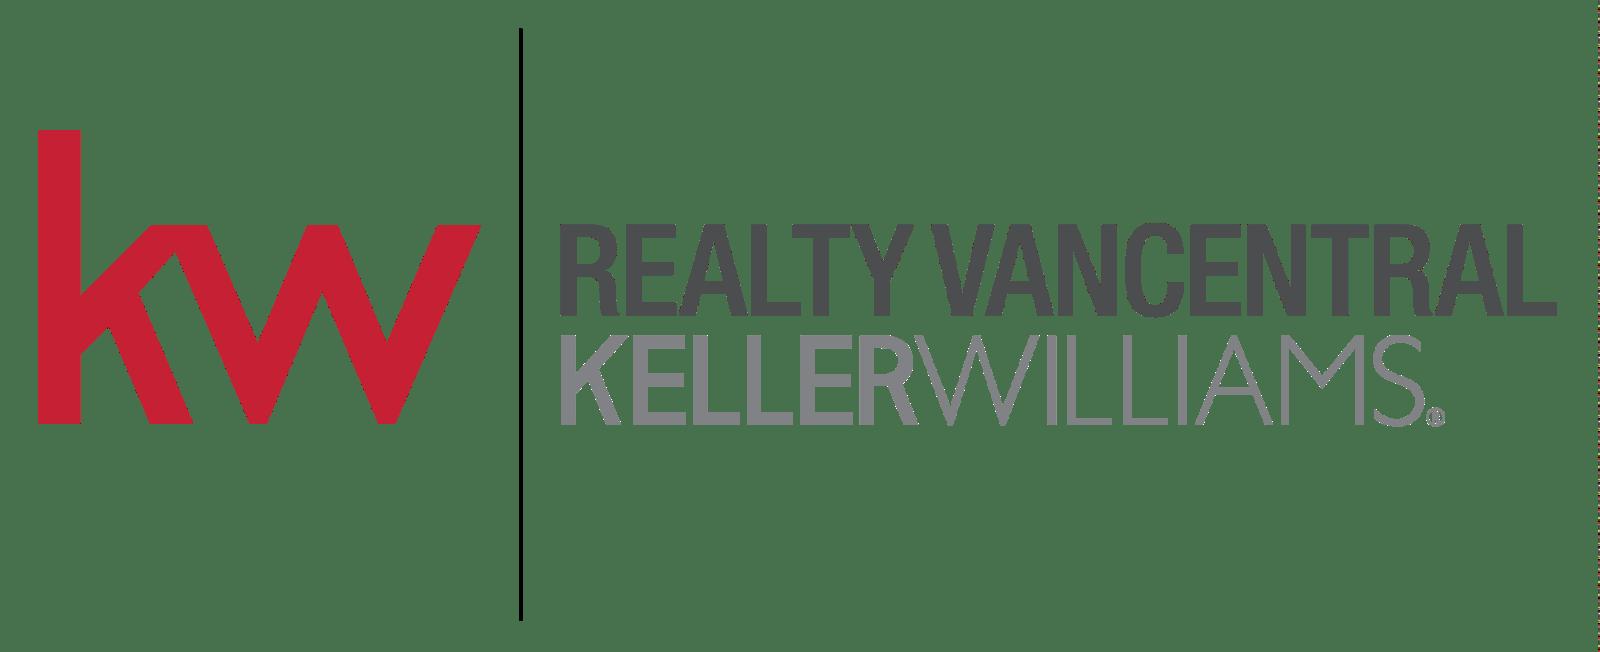 Keller Williams Realty VanCentral